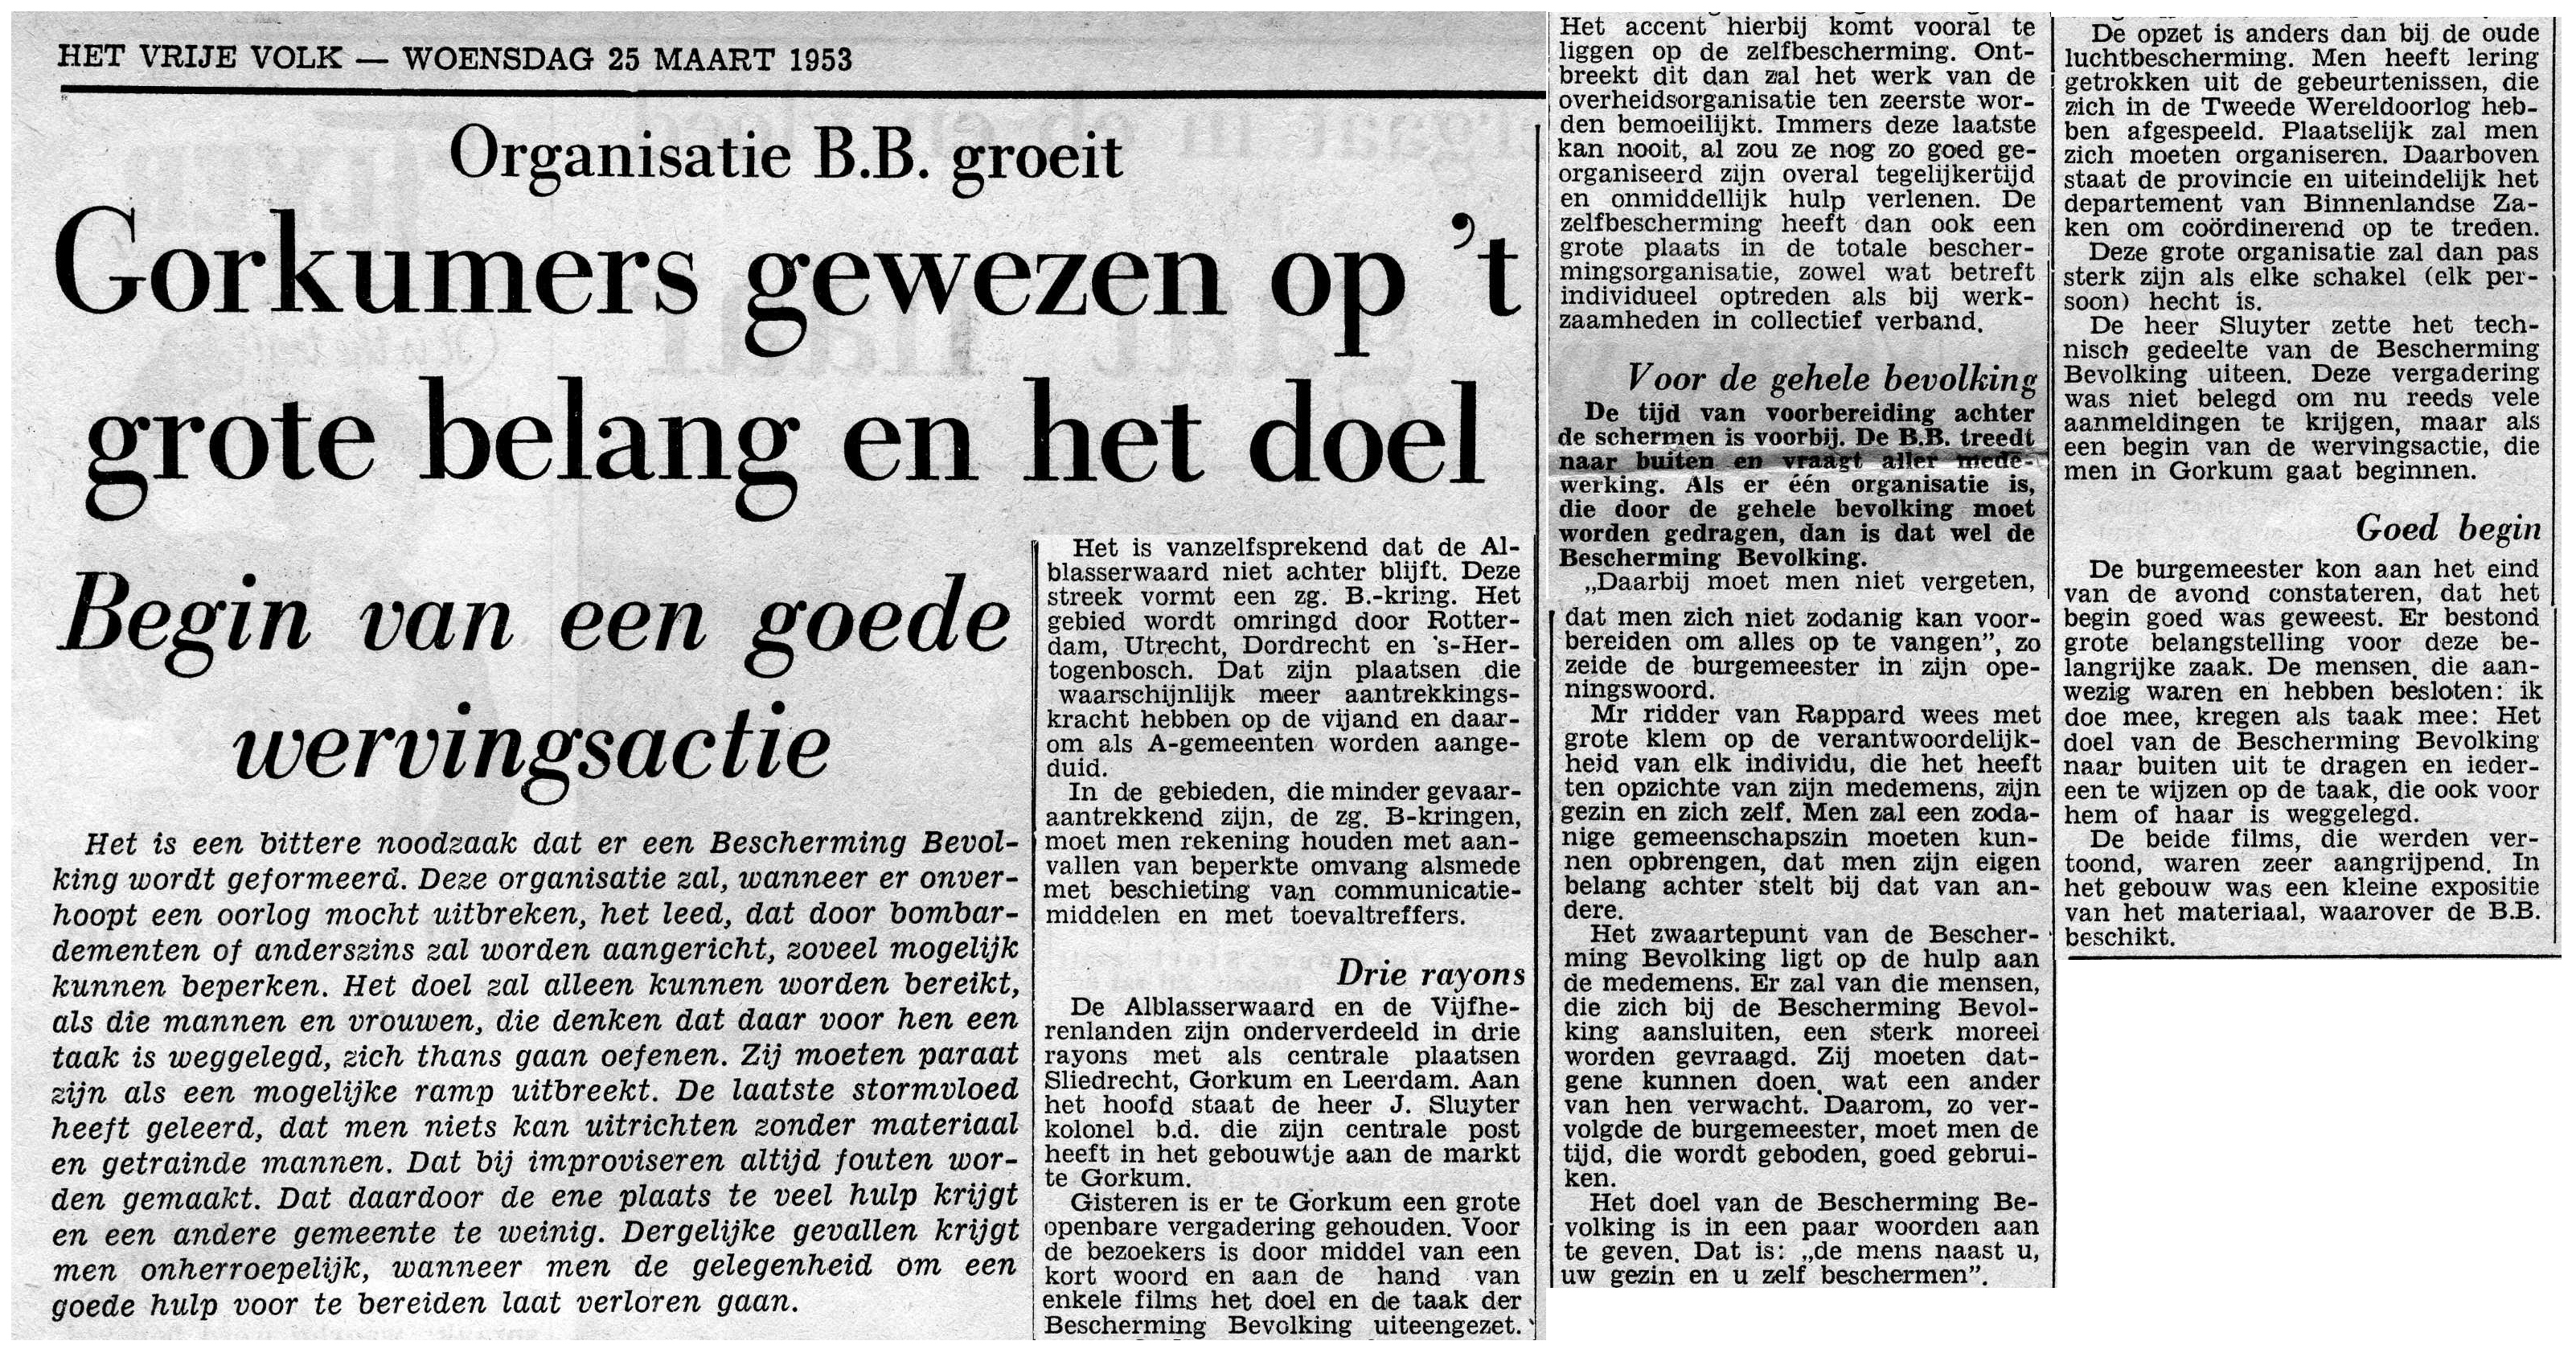 artikel vrije volk 19530325